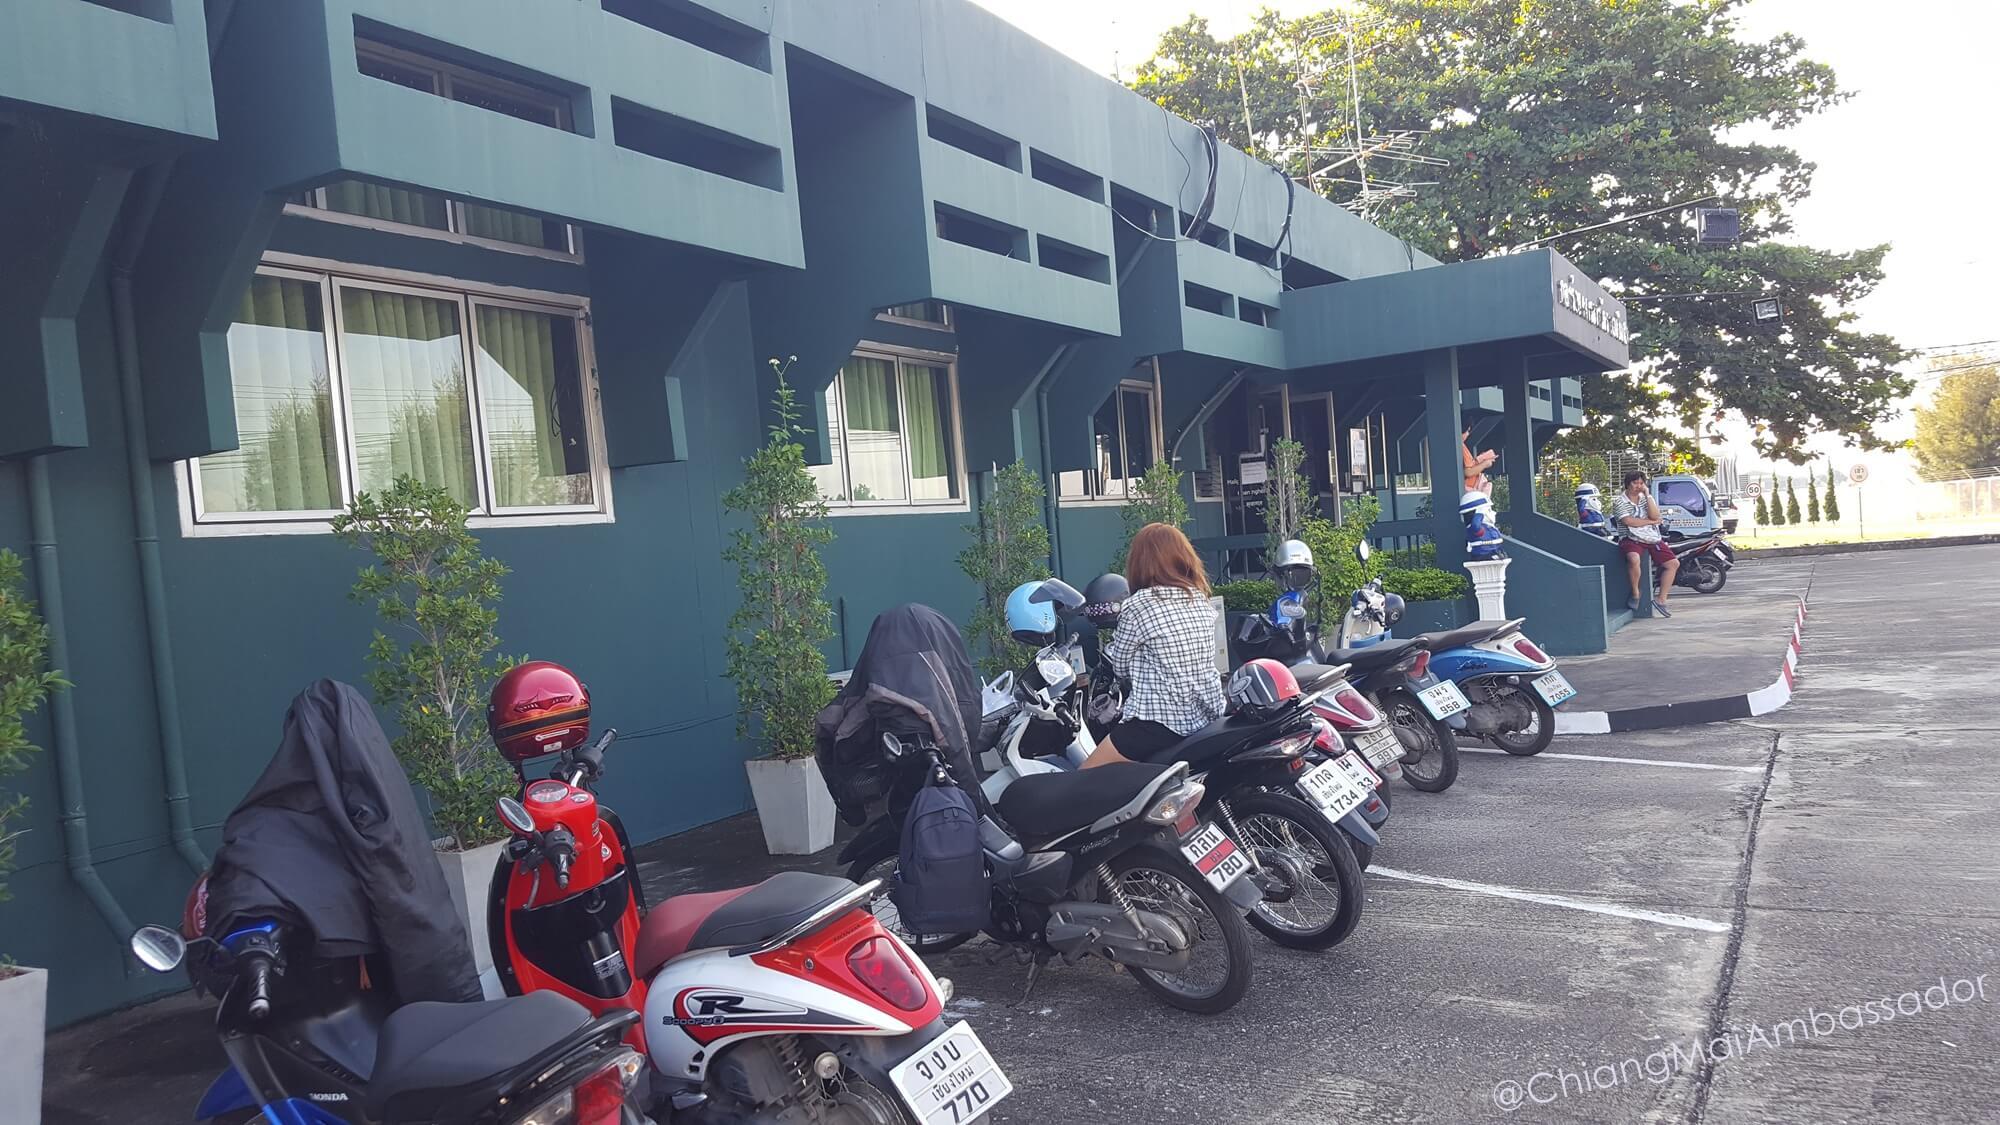 Chiang Mai Ambassador Wing 41 Pass Building 2